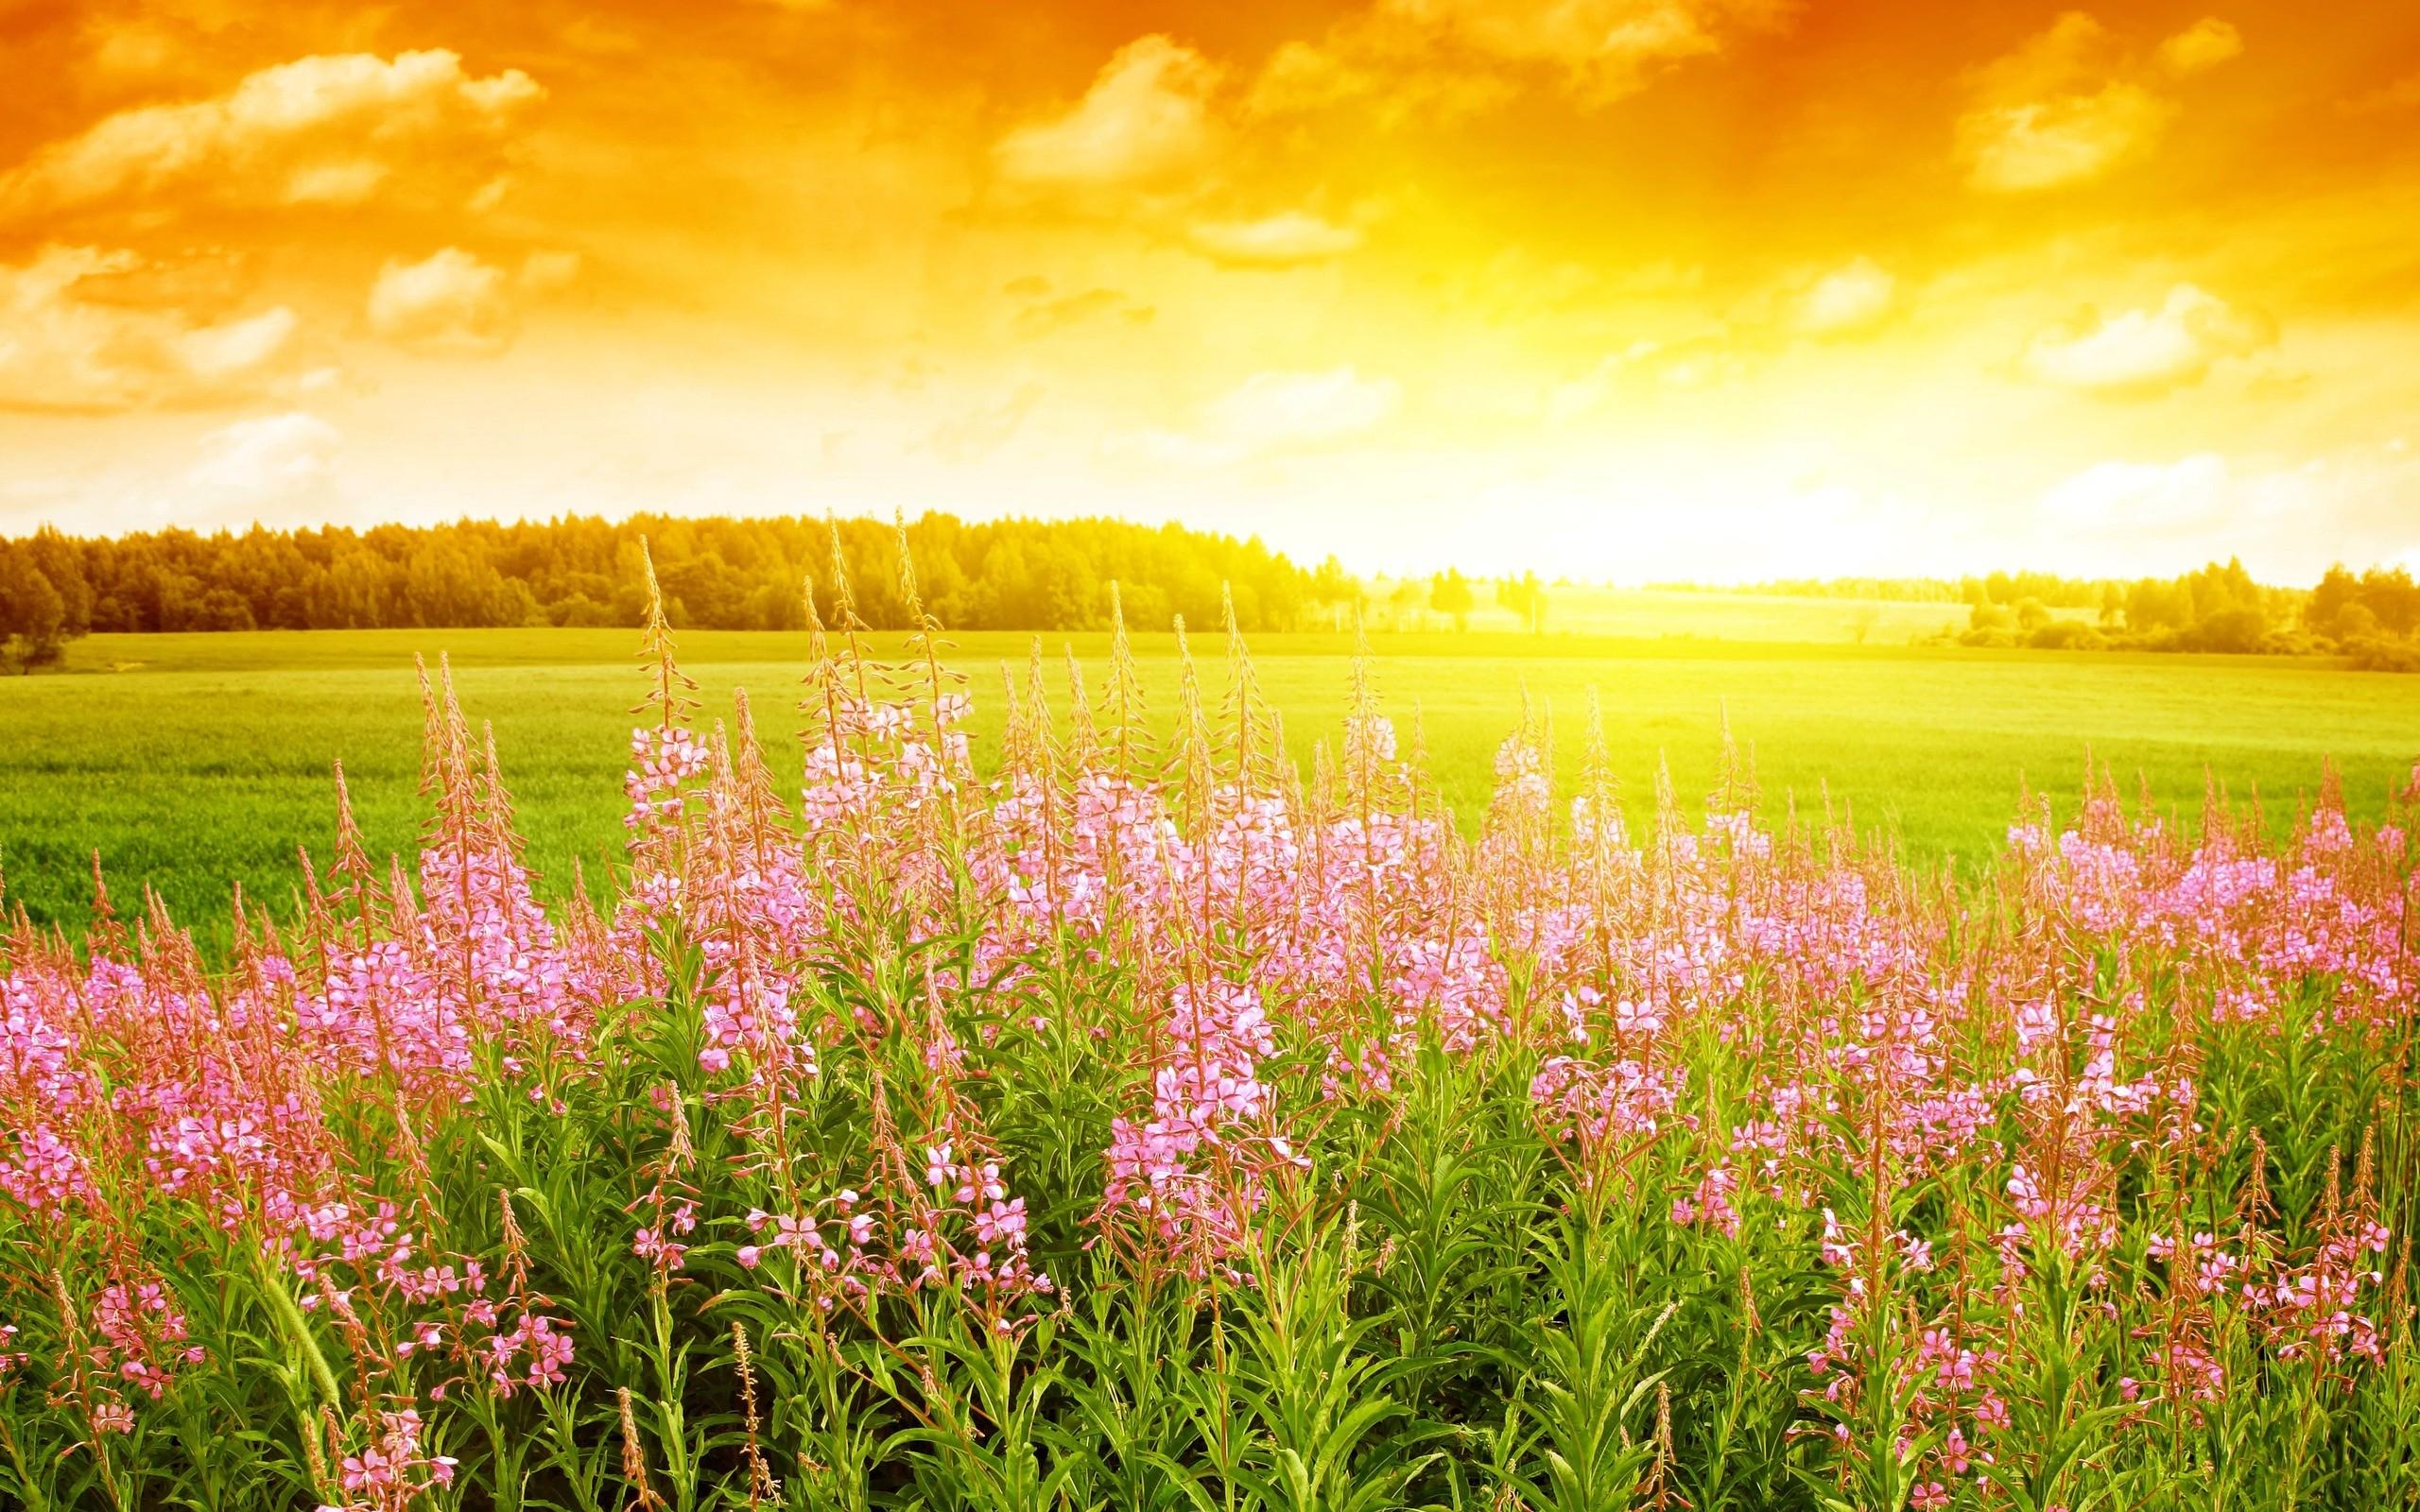 Flores rosadas en paisaje - 2560x1600